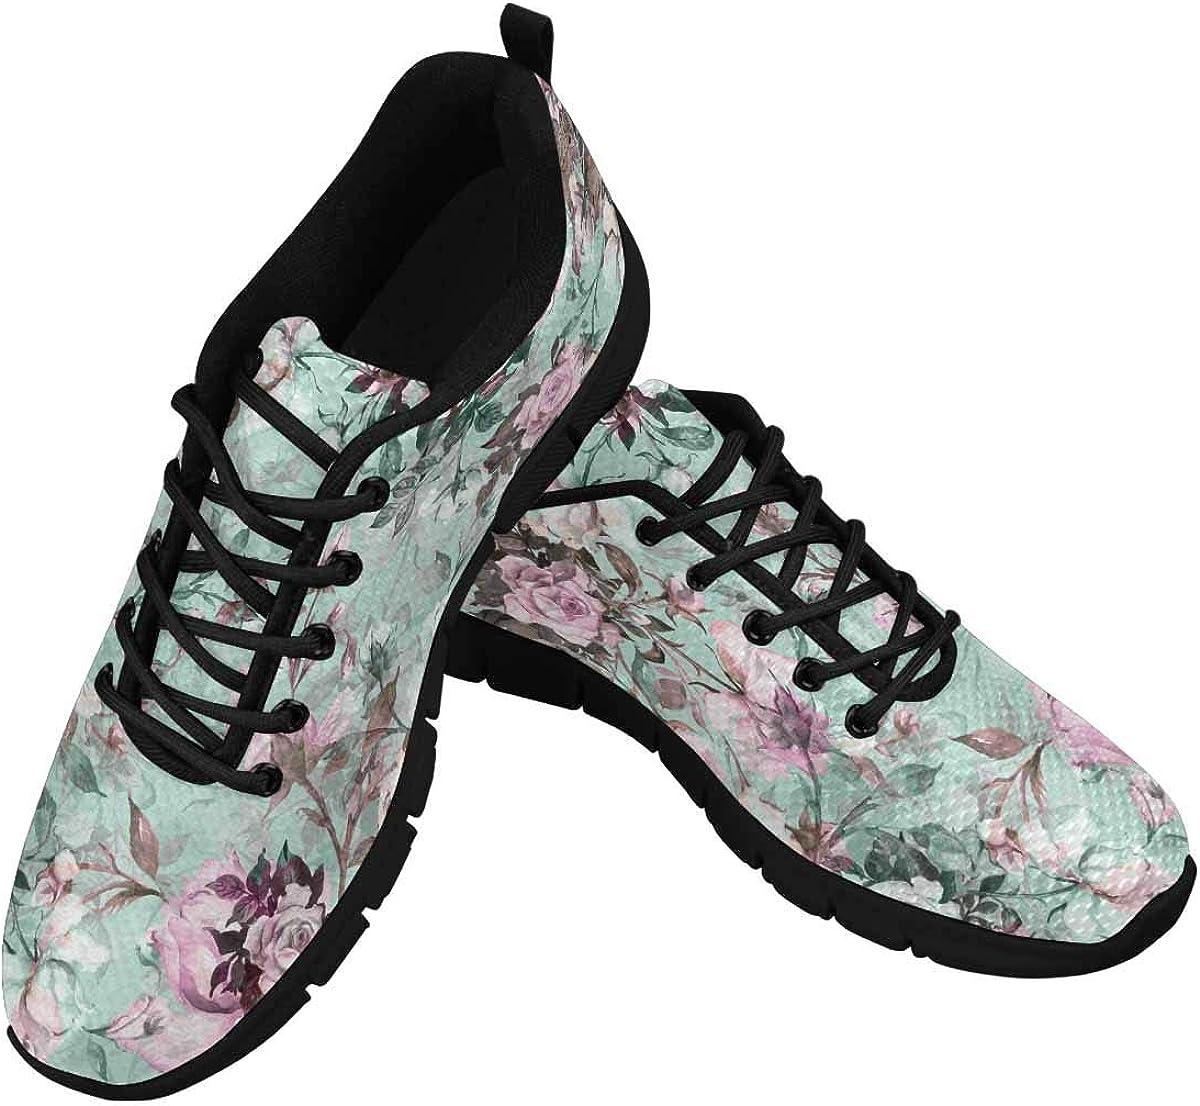 InterestPrint Beautiful Bouquet of Roses Flowers Women's Athletic Walking Shoes Breathe Comfort Mesh